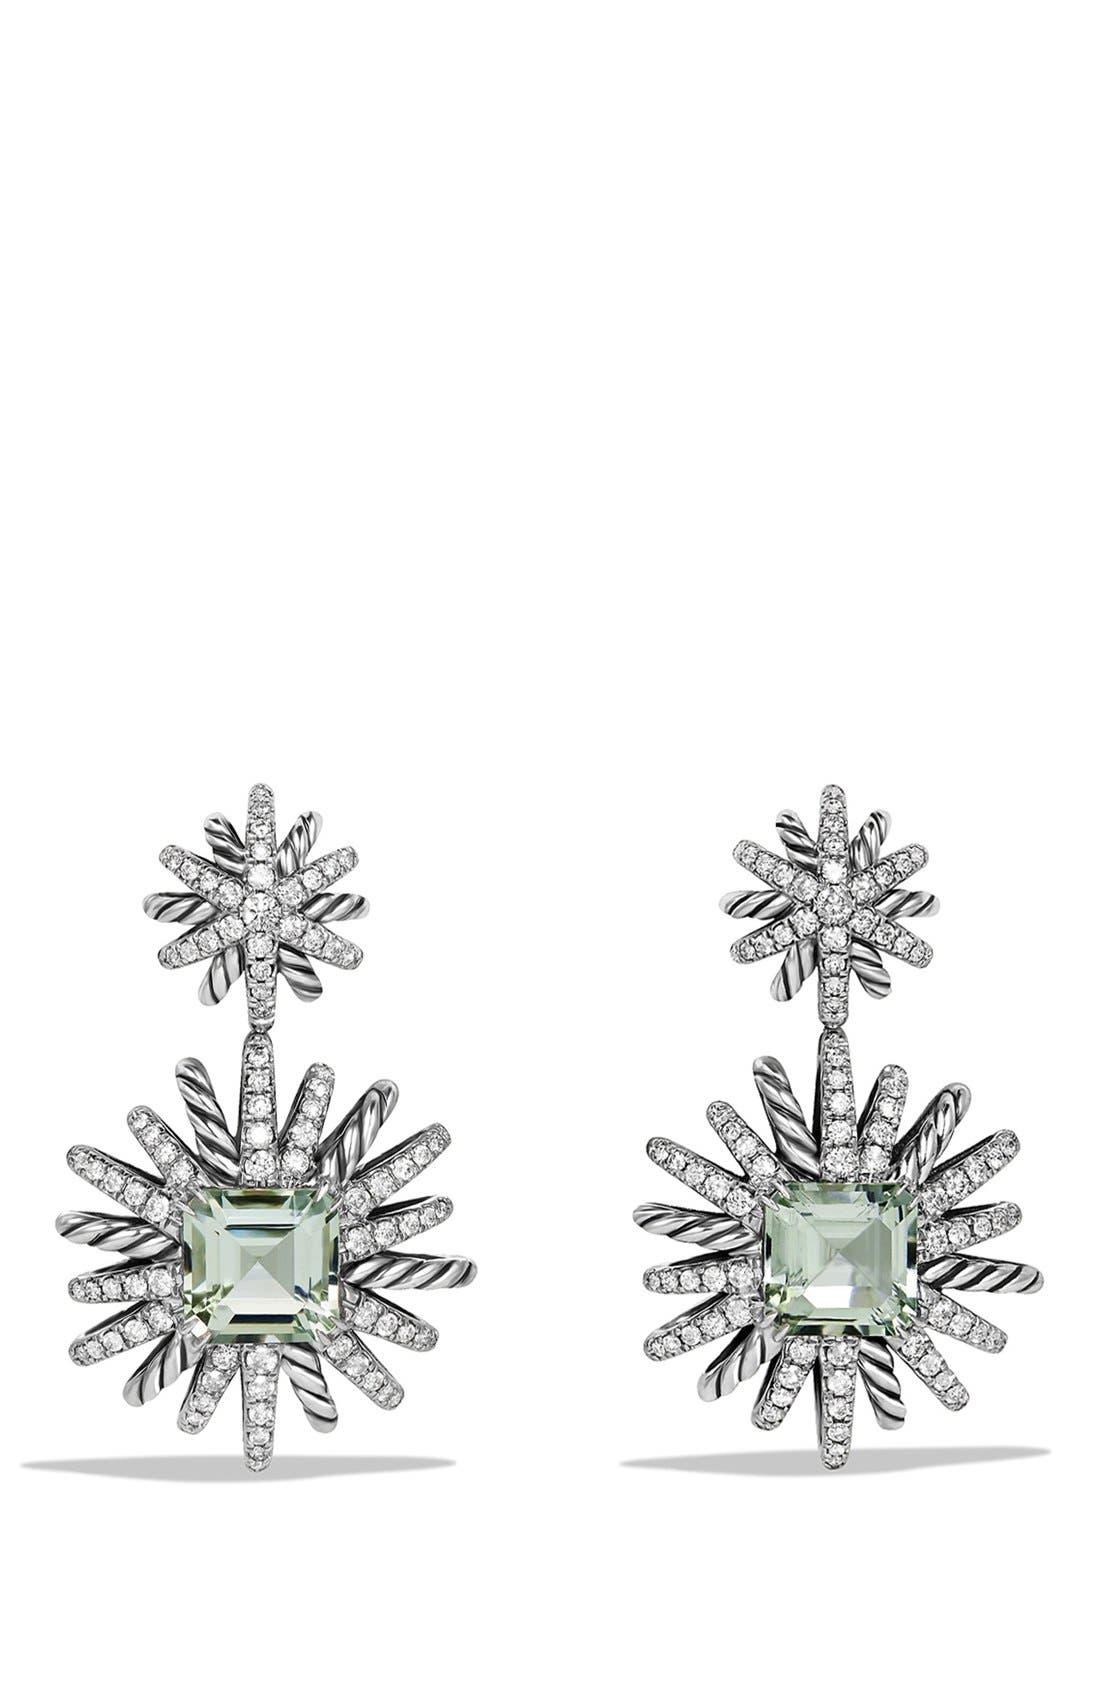 David Yurman 'Starburst' Earrings with Diamonds in Silver